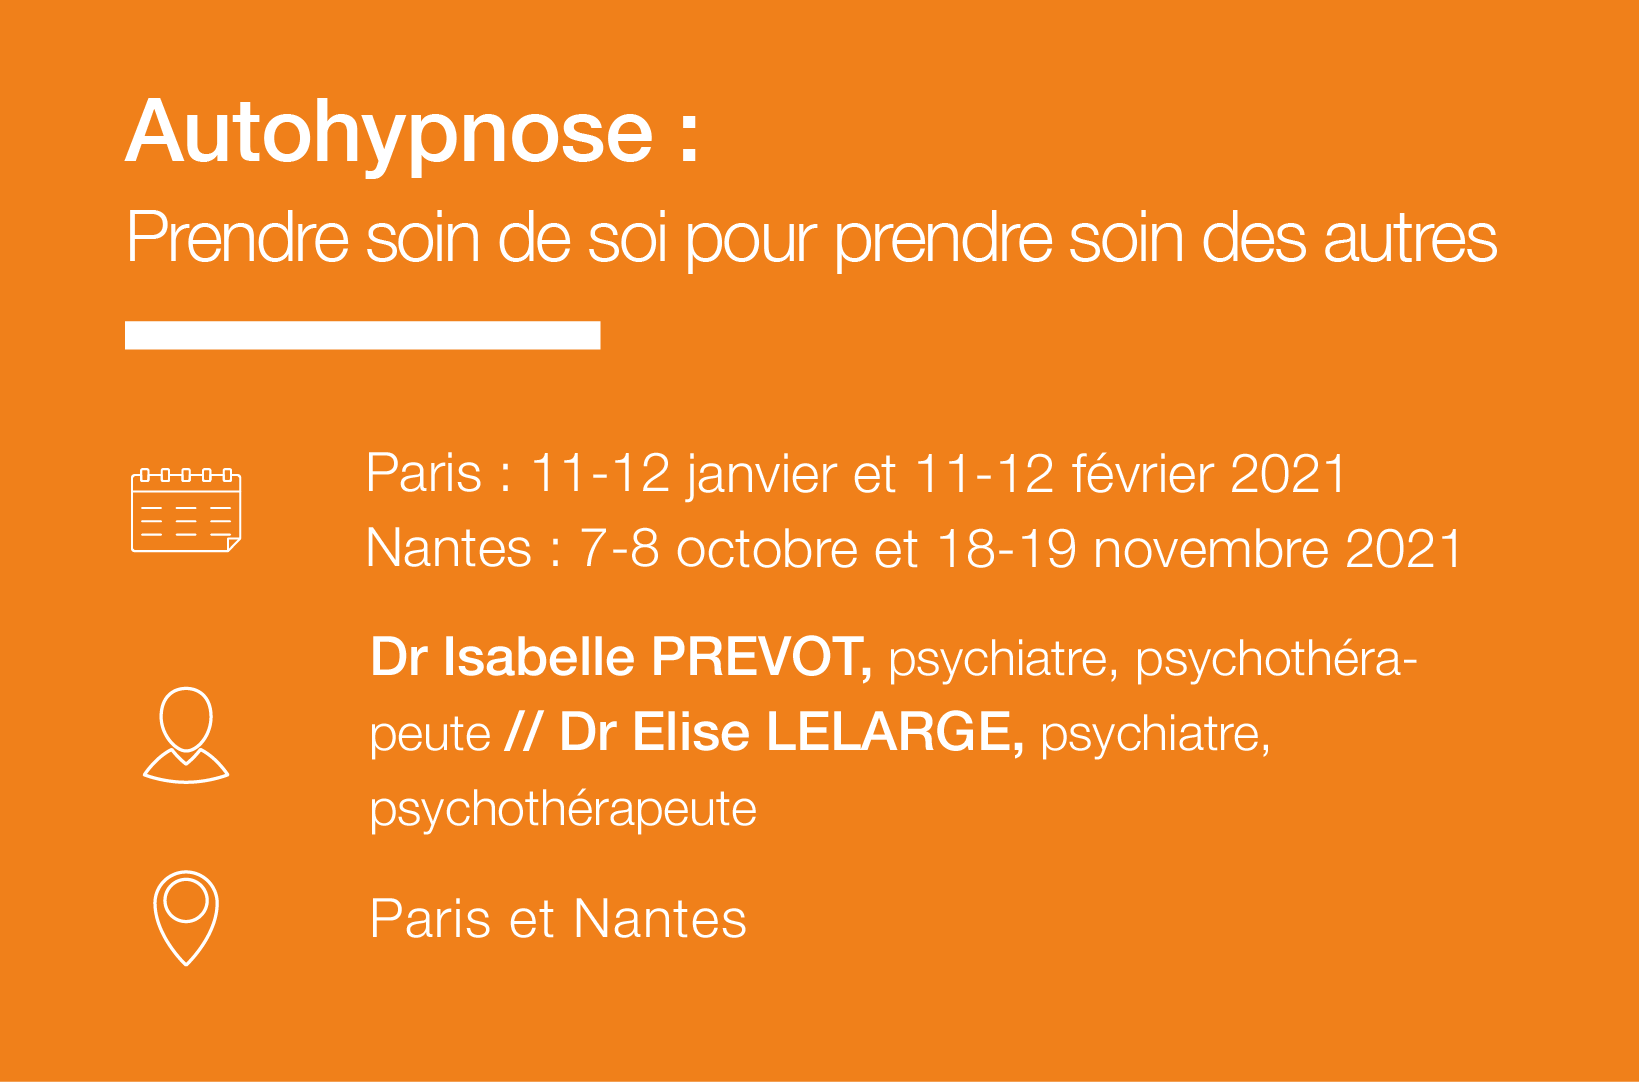 Seminaire Autohypnose Prendre soin de soi IFH